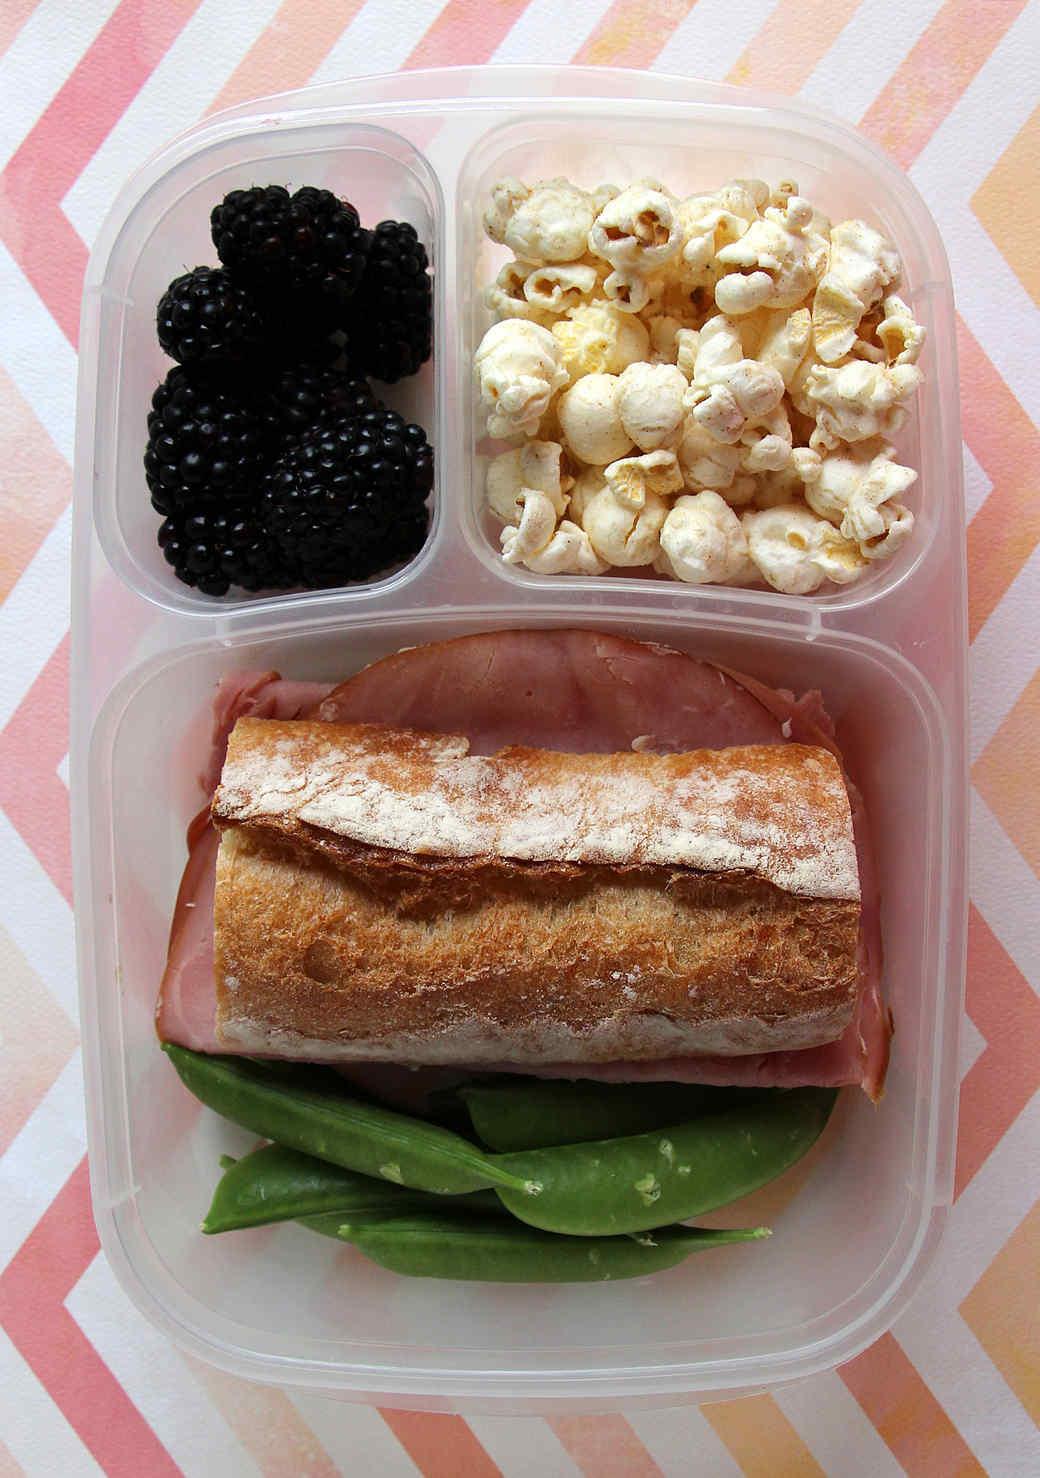 jambon-beurre-nut-free-lunch.jpg (skyword:335877)